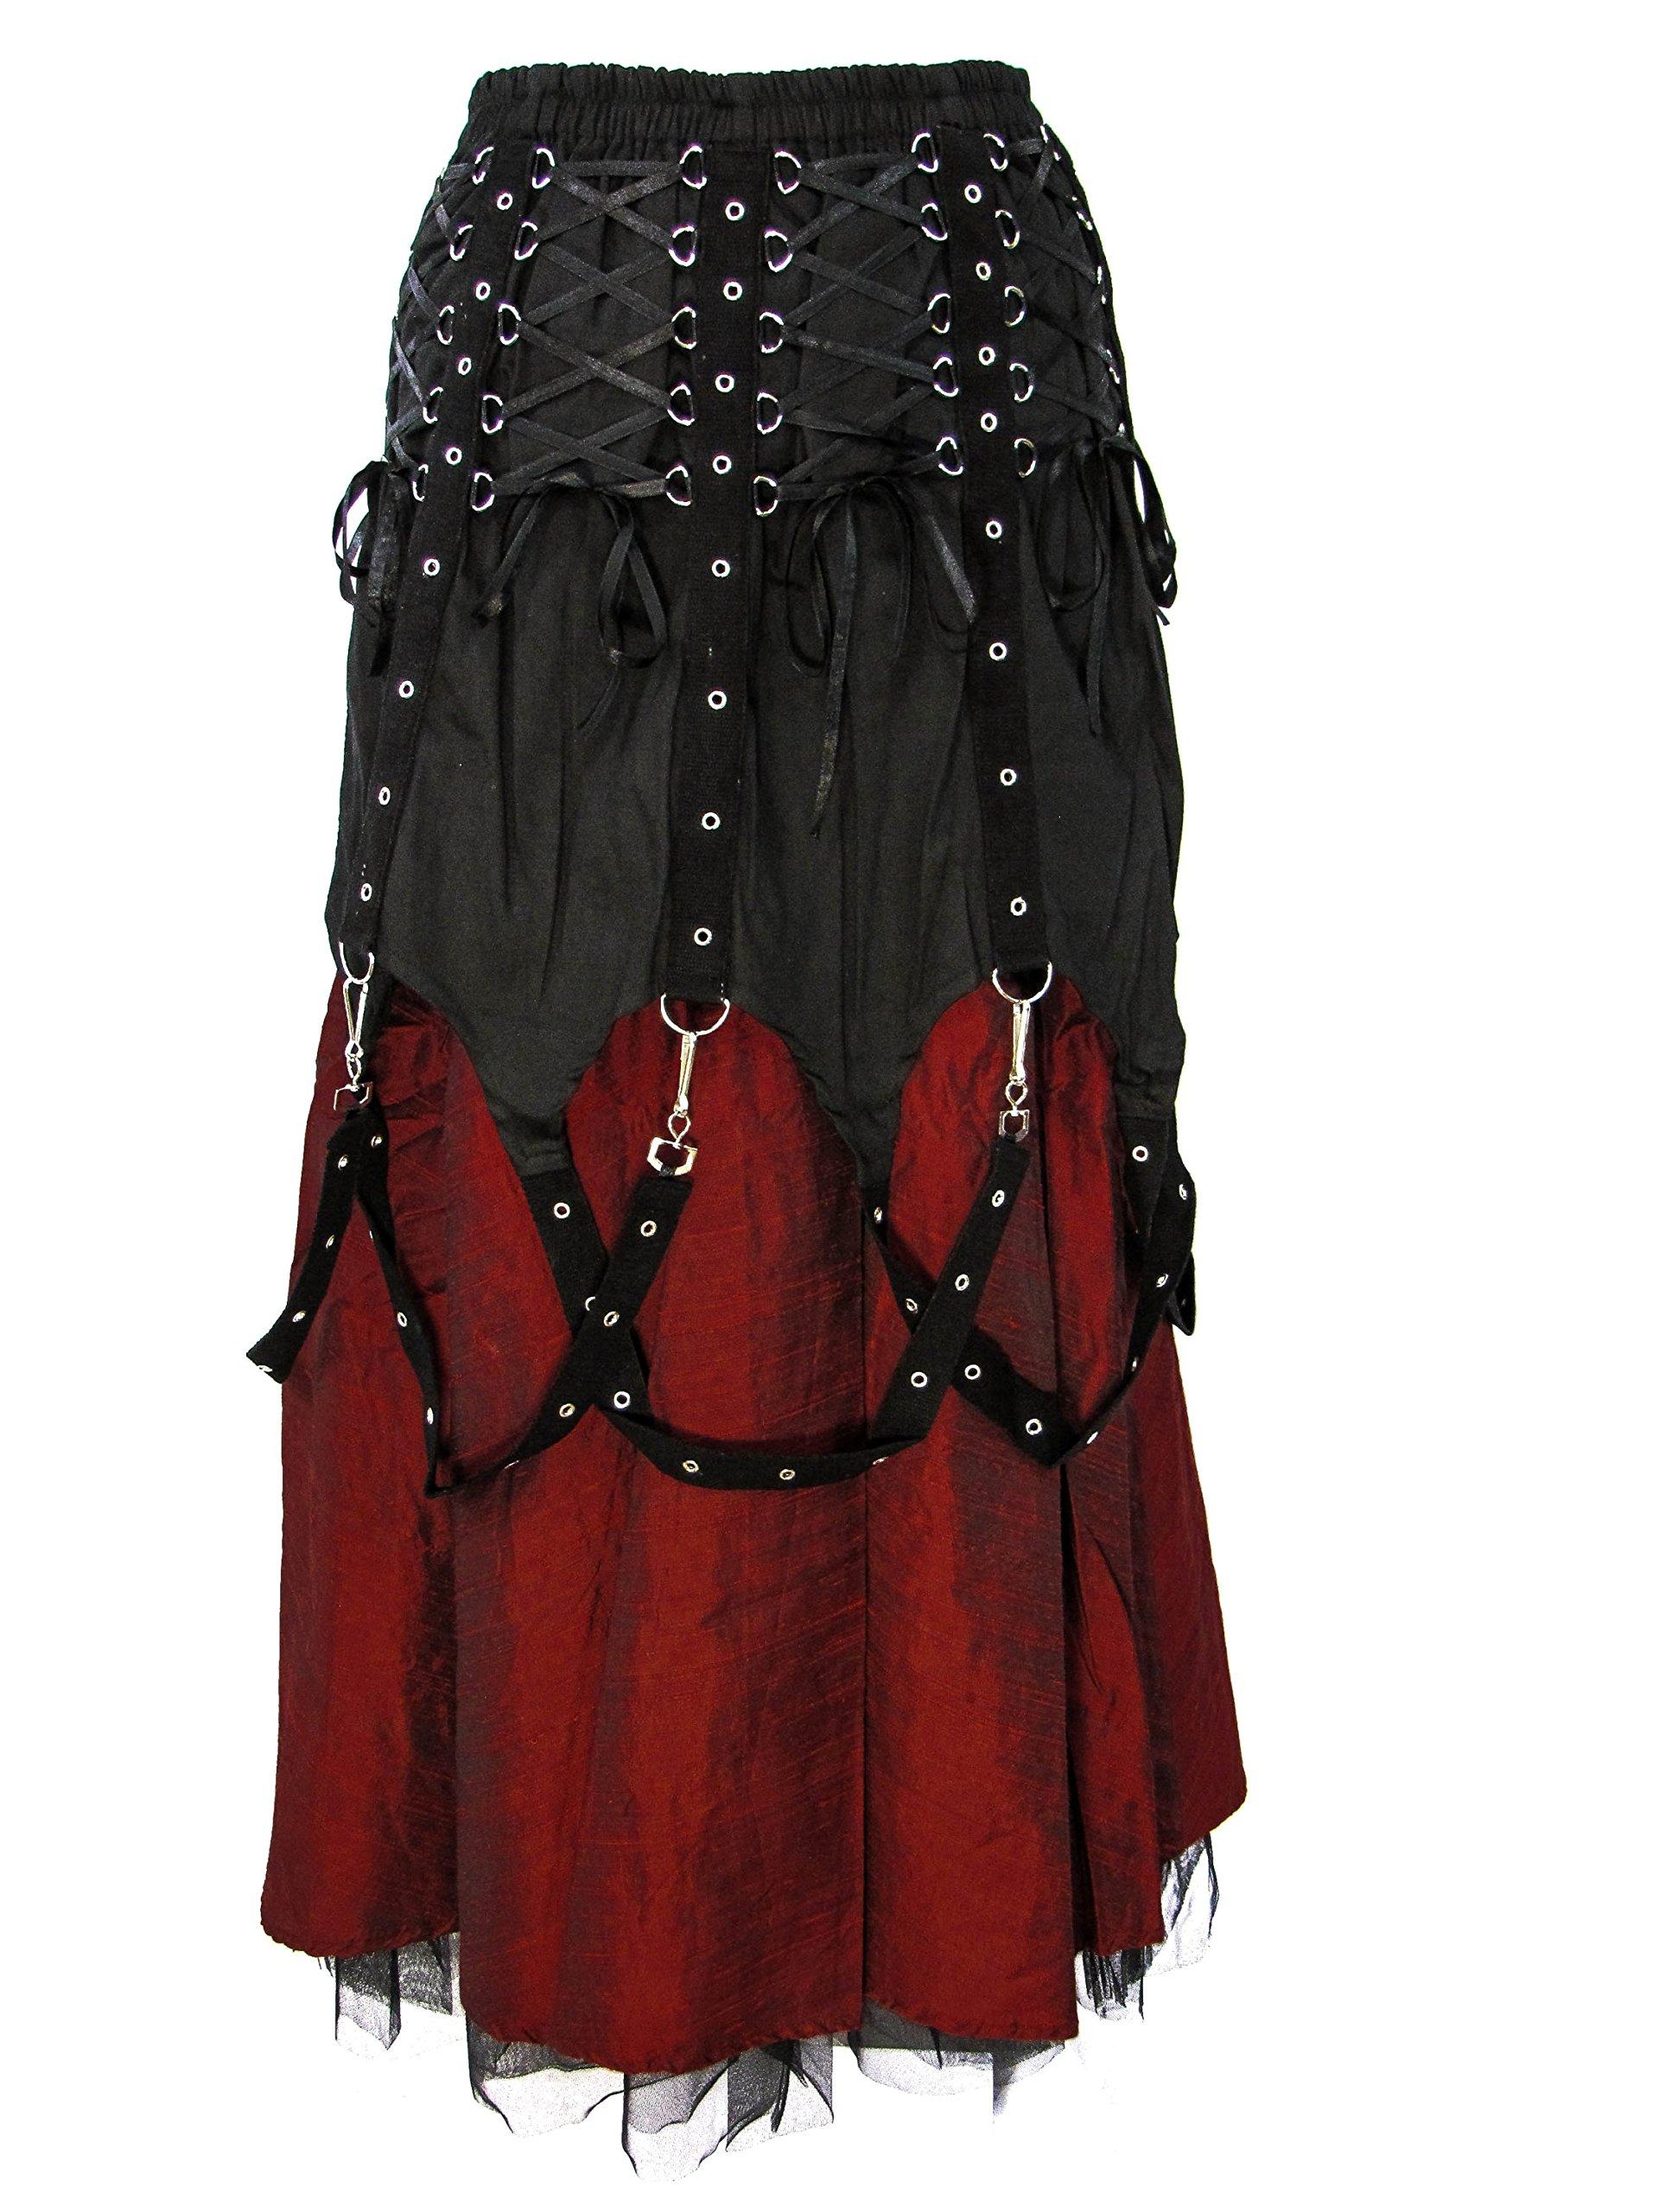 Dark Star Black Red Gothic Medieval Vampire Punk Chains Long Skirt M-2X Plus Size